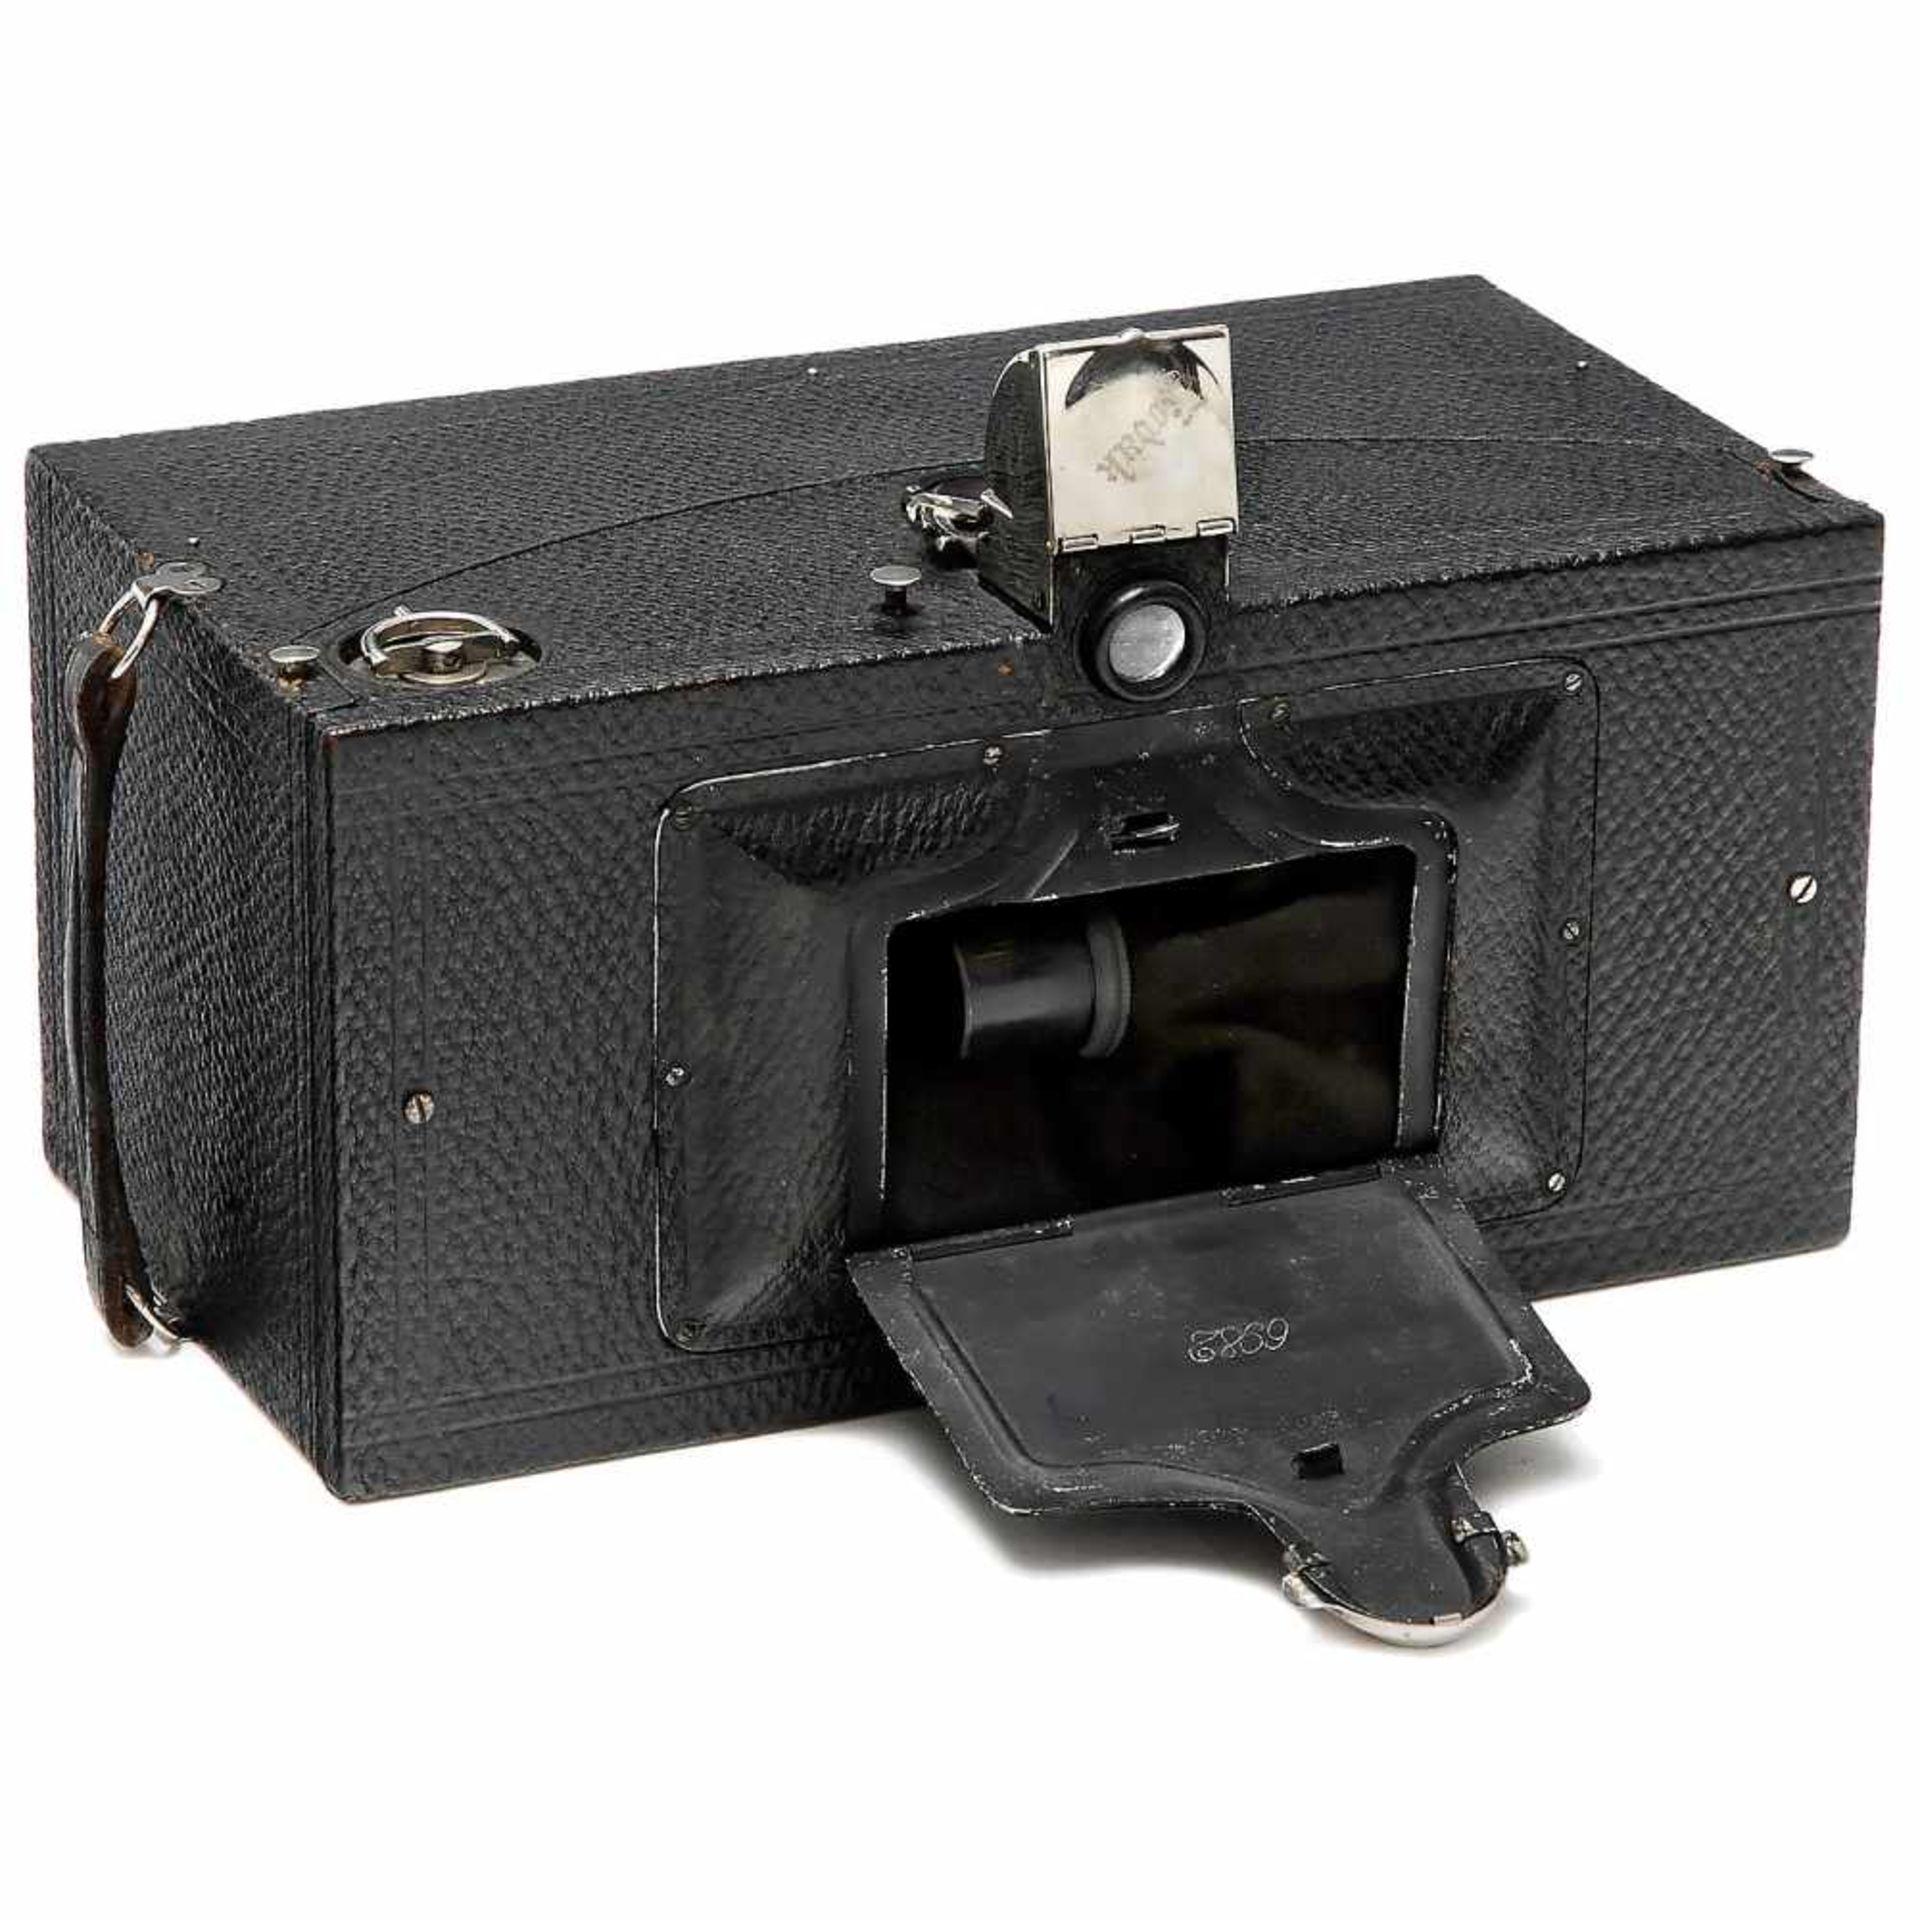 No. 4 Panoram-Kodak, c. 1900Eastman Kodak, Rochester. Model B, size 3½ x 12 in. on film type 103,